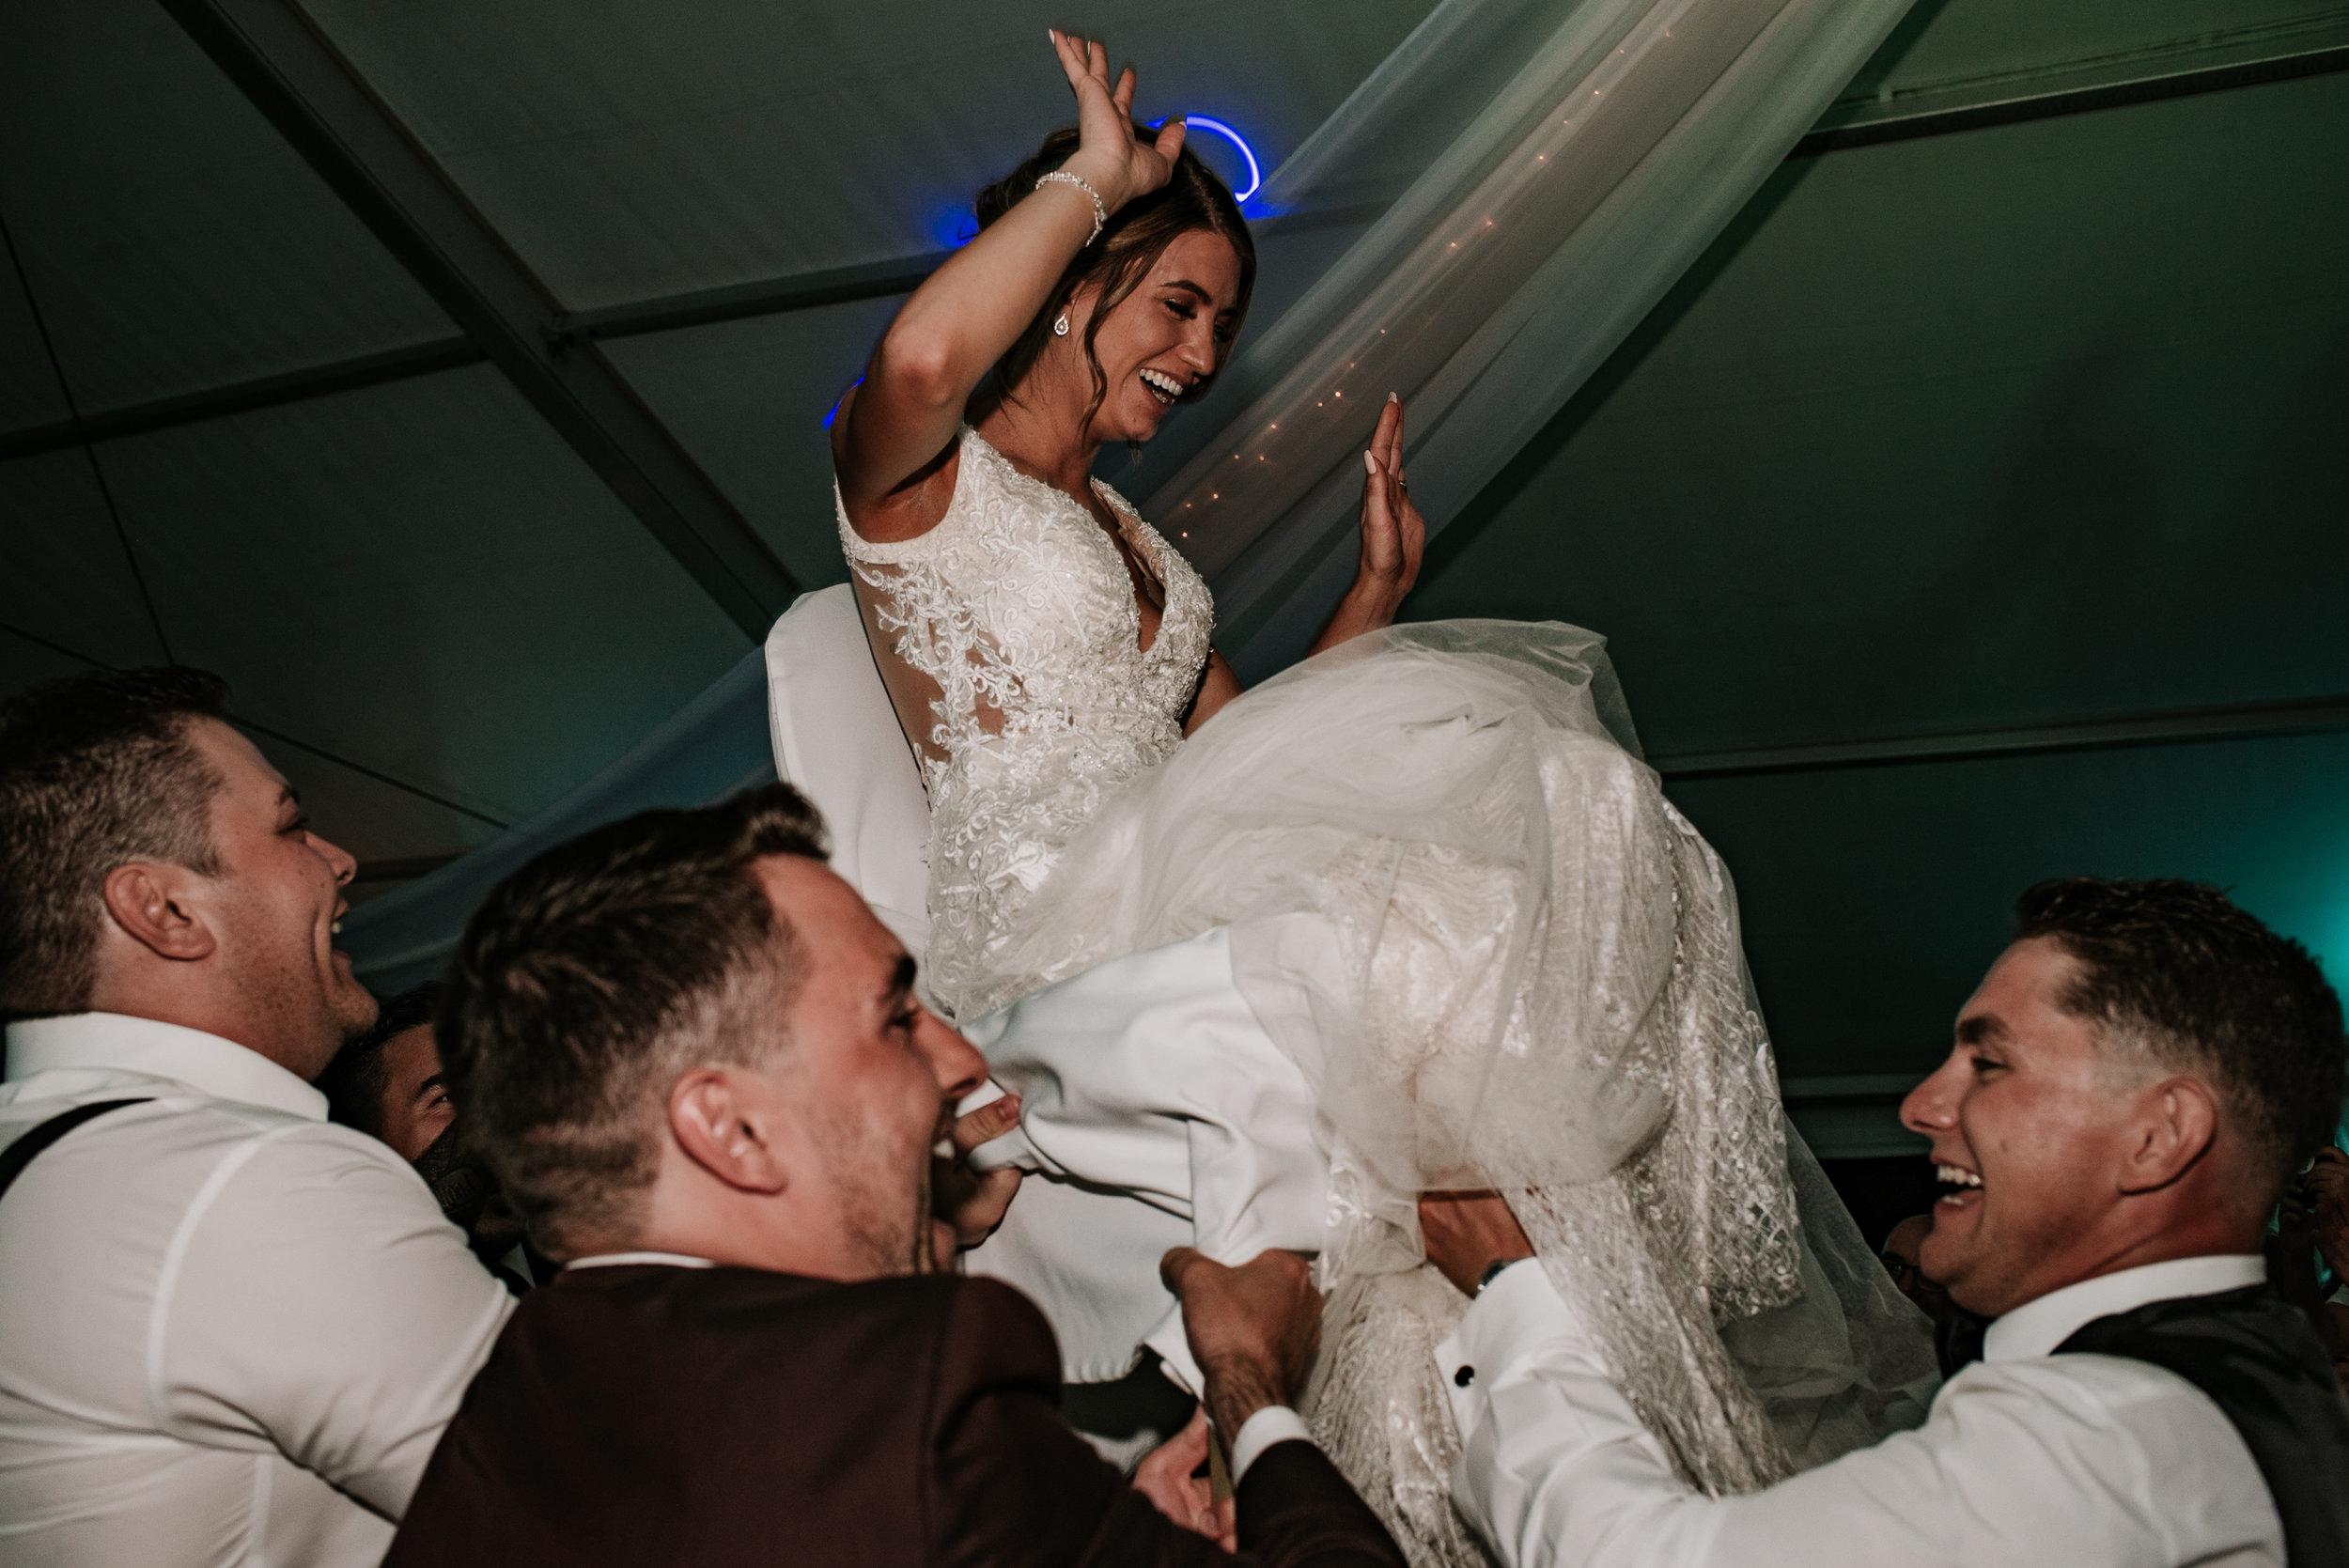 Claremont_fourseasons_Wedding-523.jpg